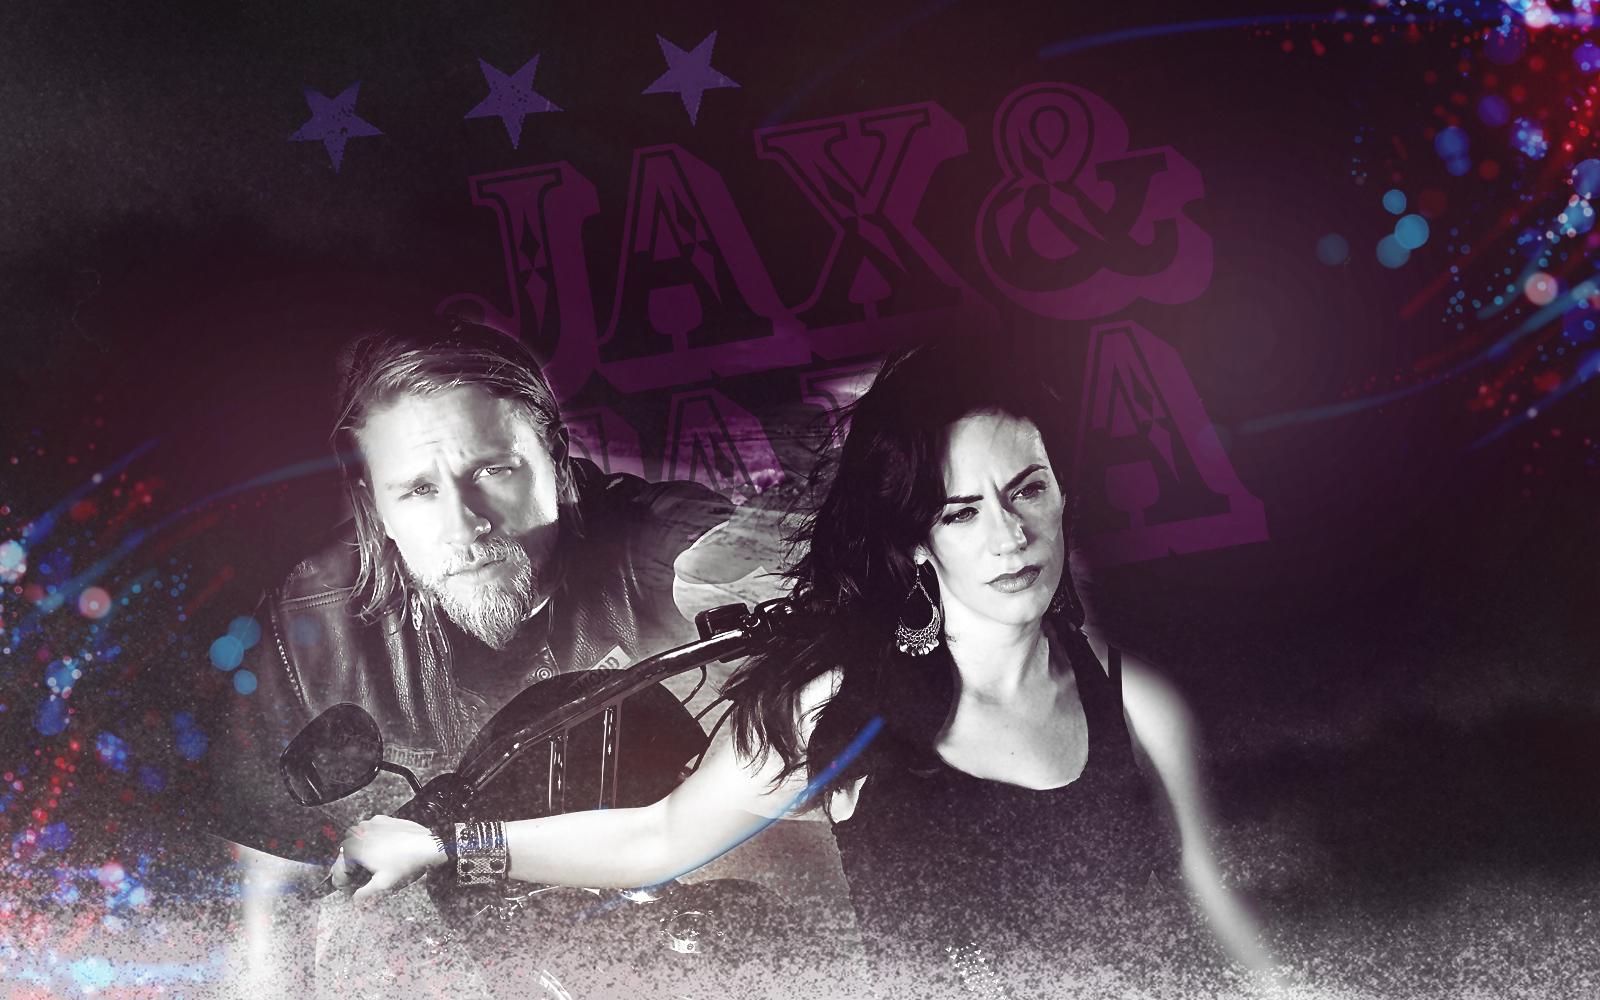 Free Download Sons Of Anarchy Wallpaper Jax And Tara 1600x1000